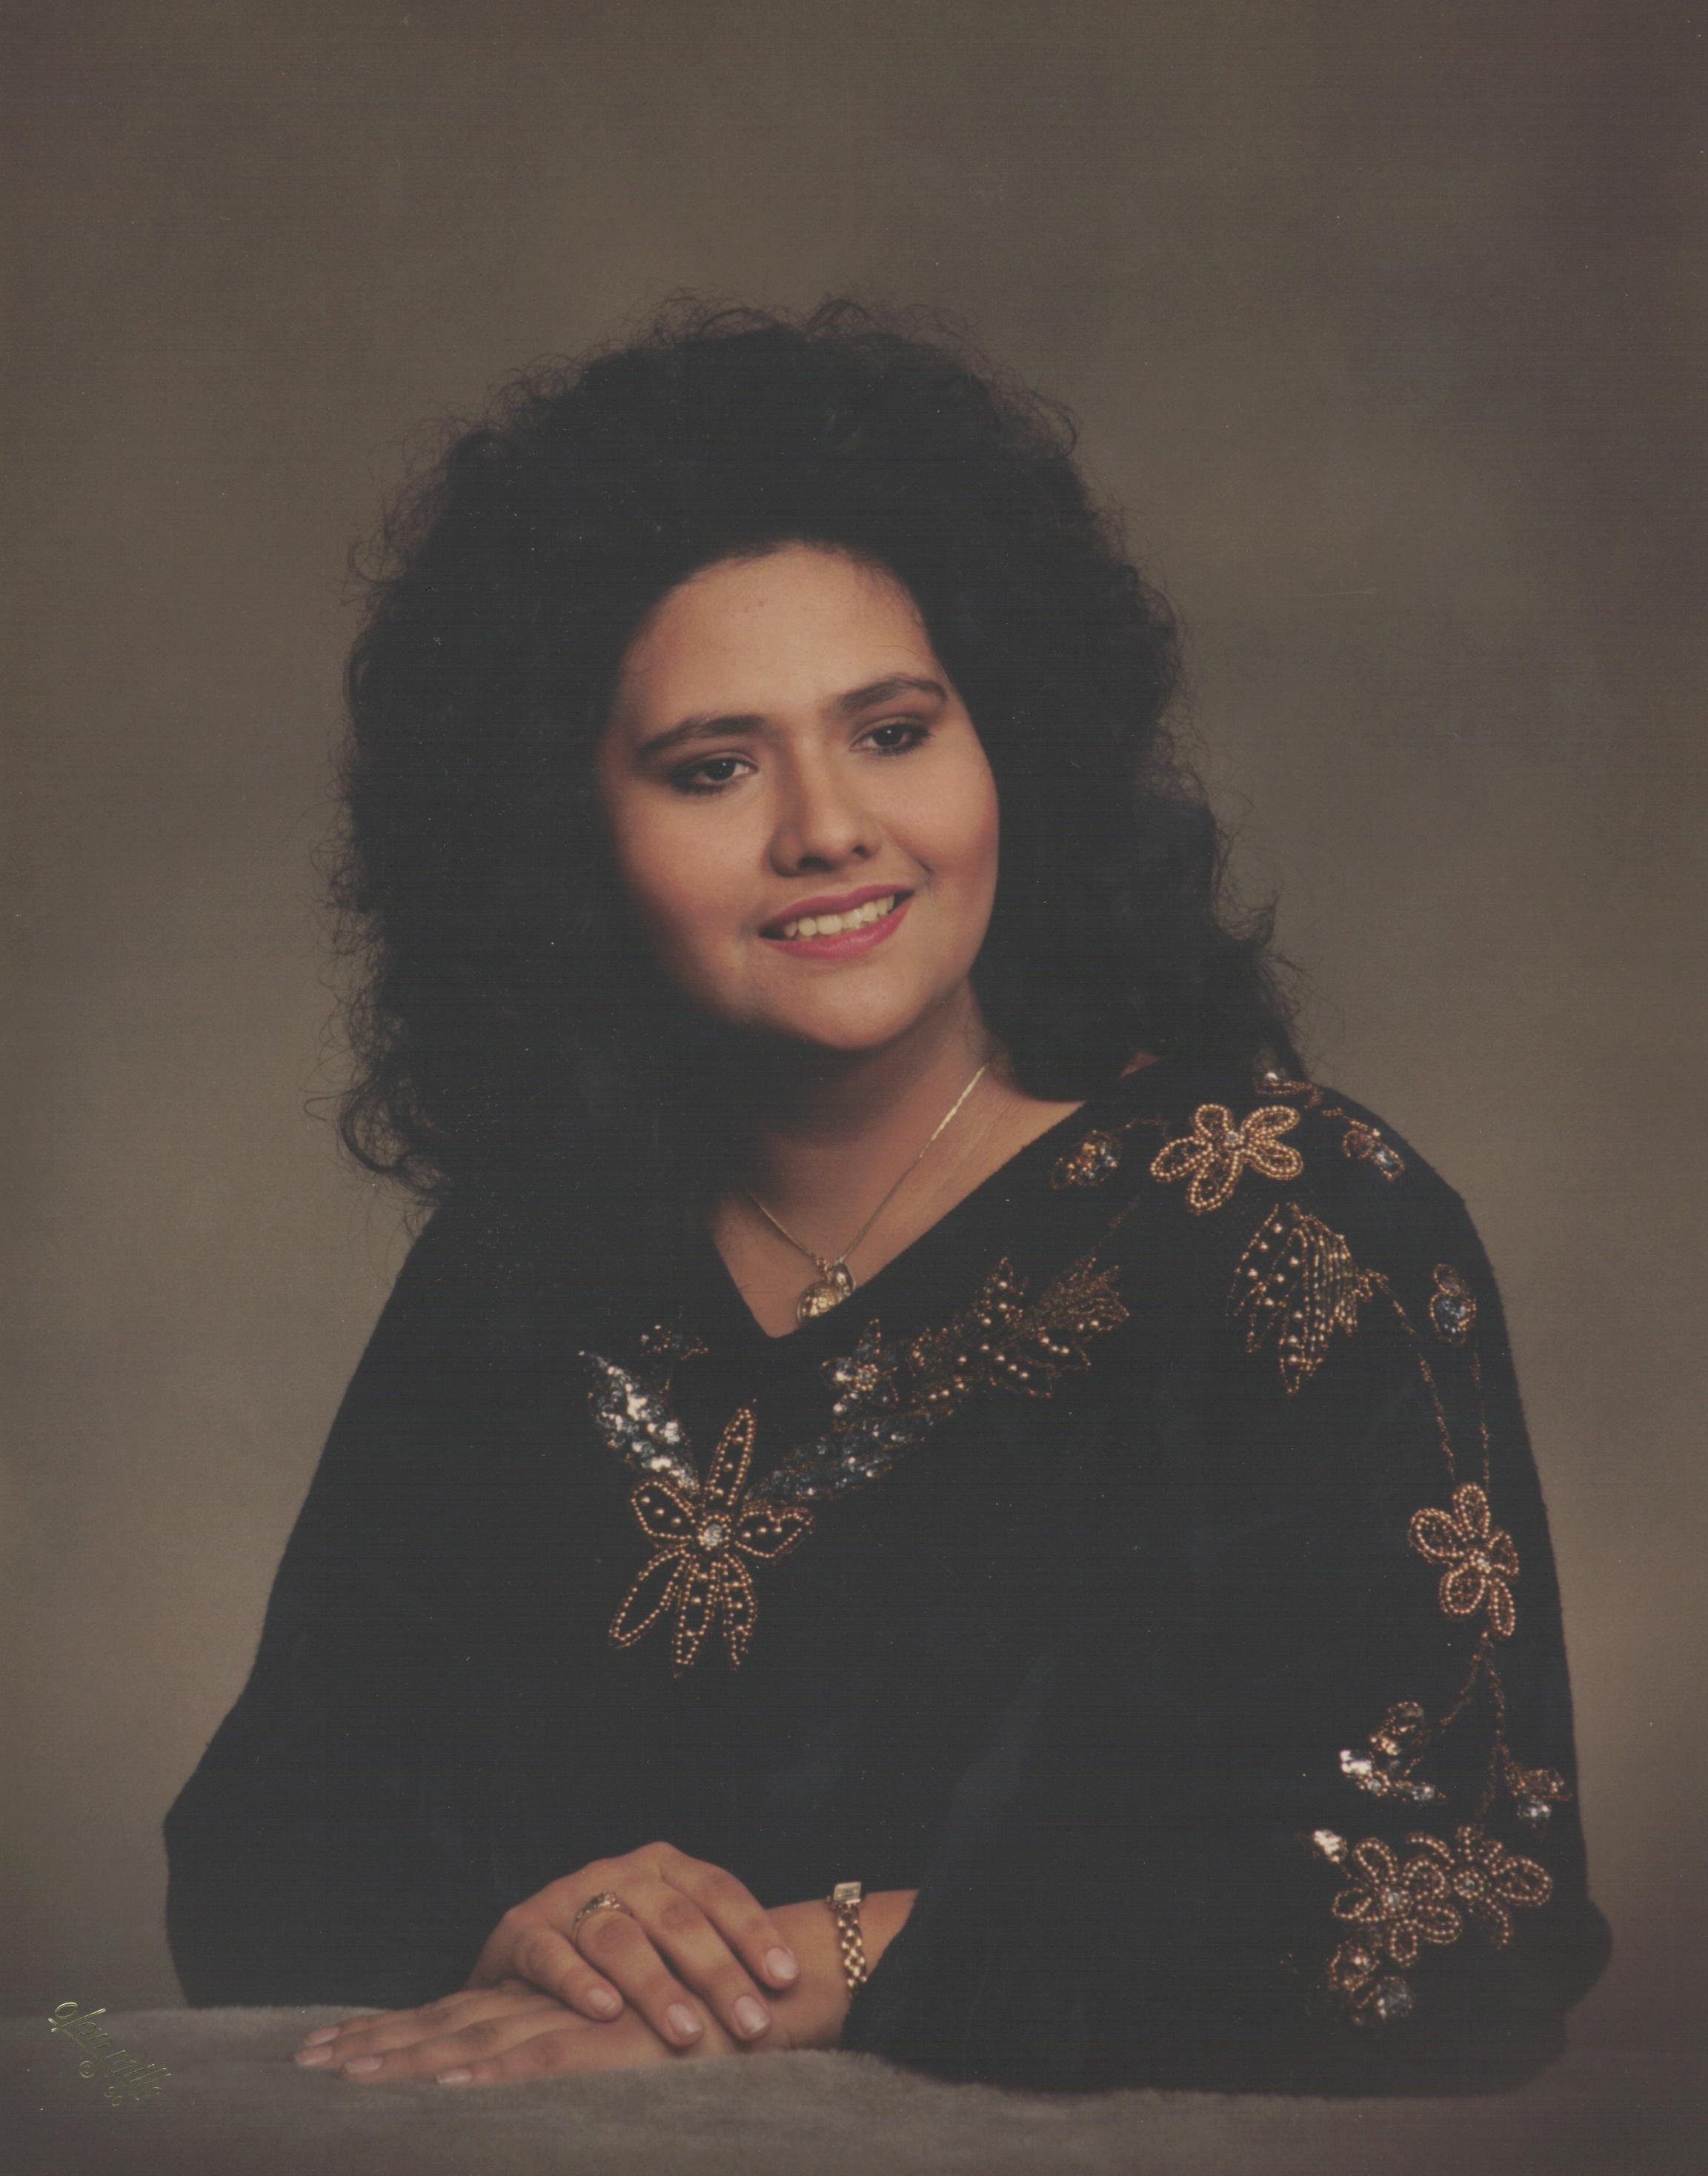 Leticia Dominguez, age 44 of Snyder, Nebr